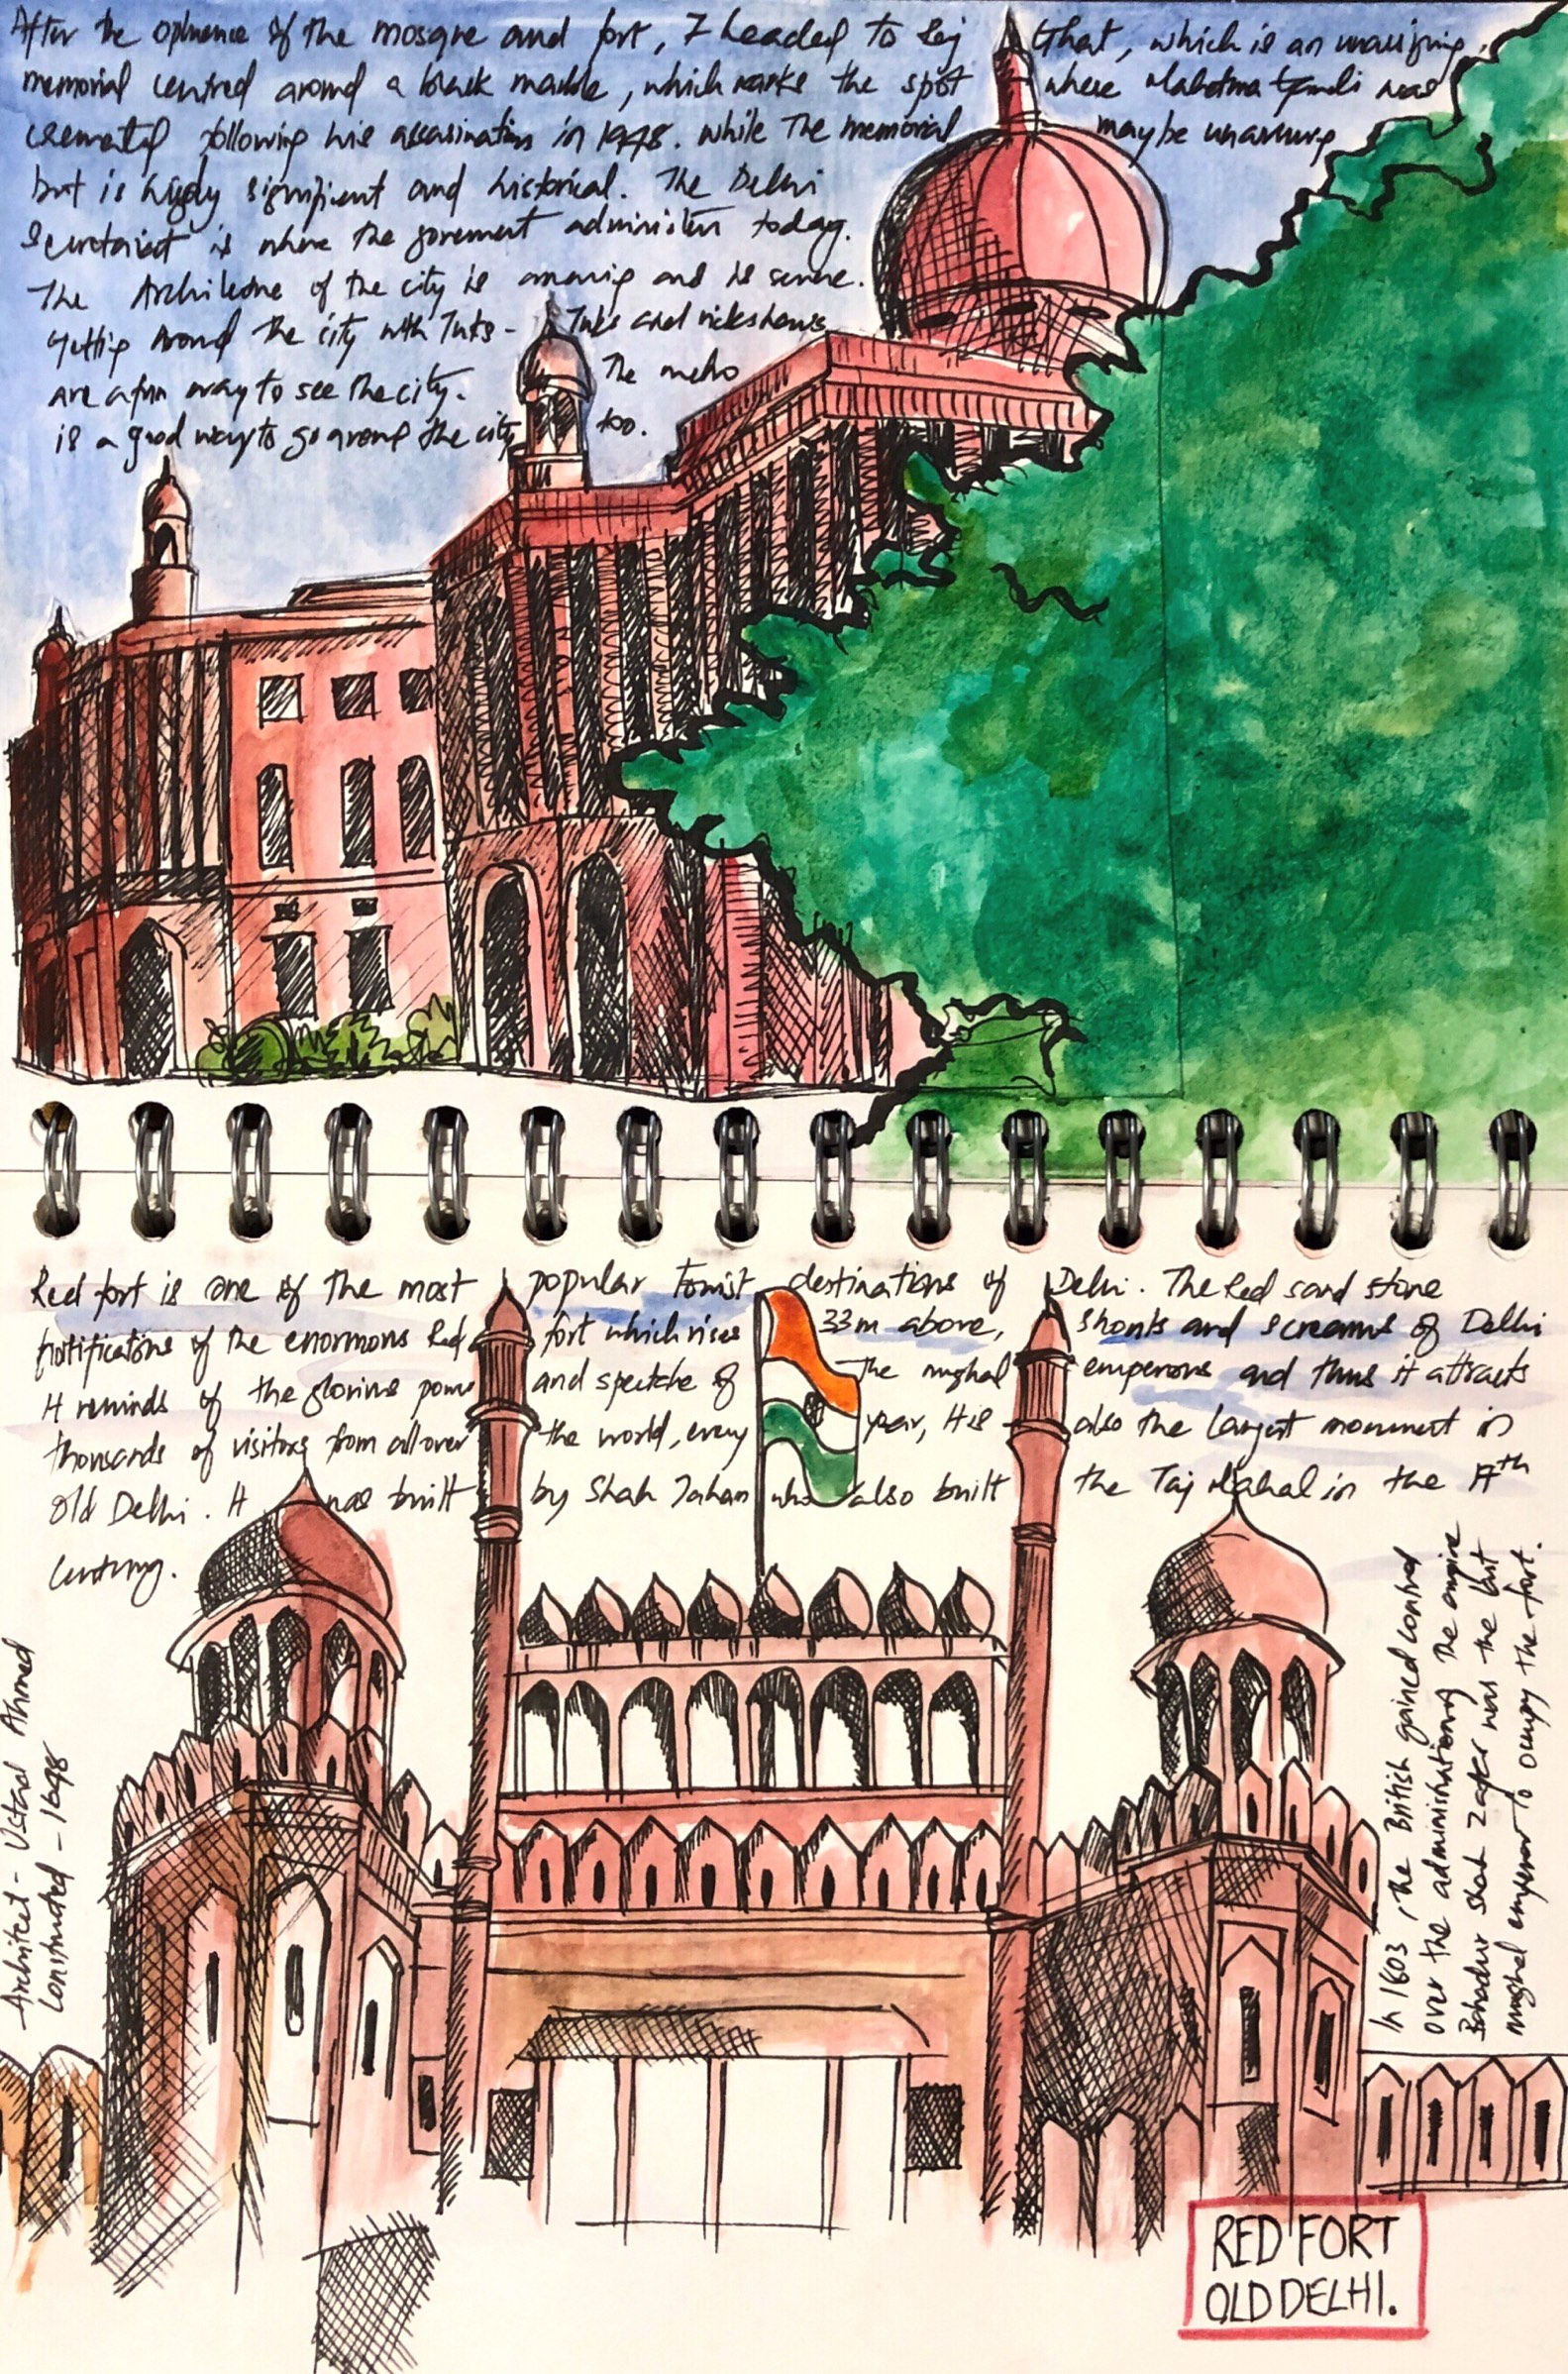 Red-fort-delhi